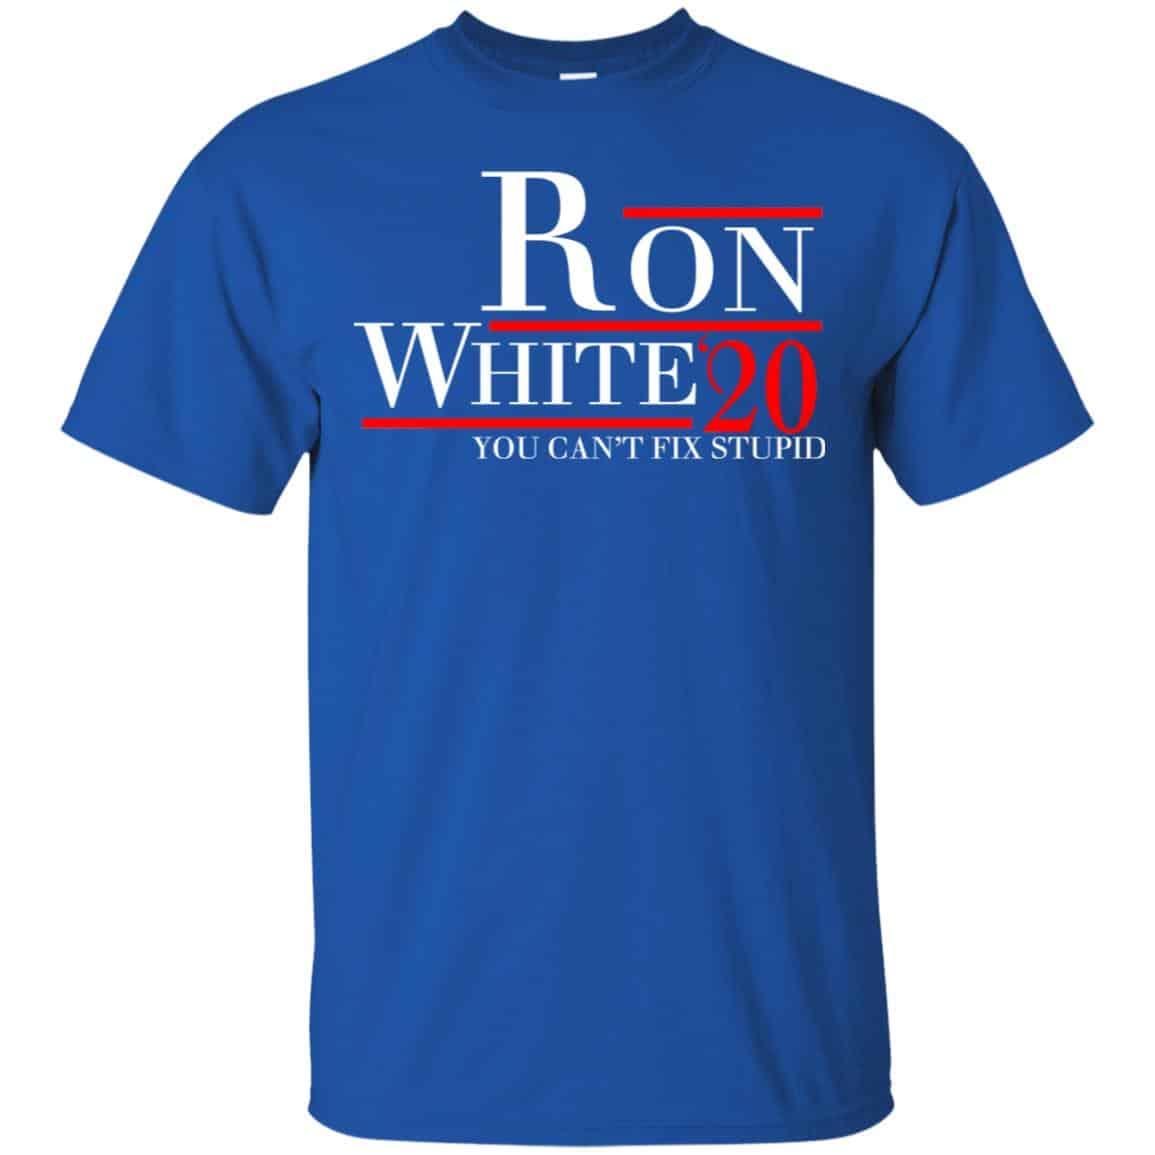 NO ONE CAN Hoodie Shirt Premium Shirt Black IF Boyfriend Cant FIX IT